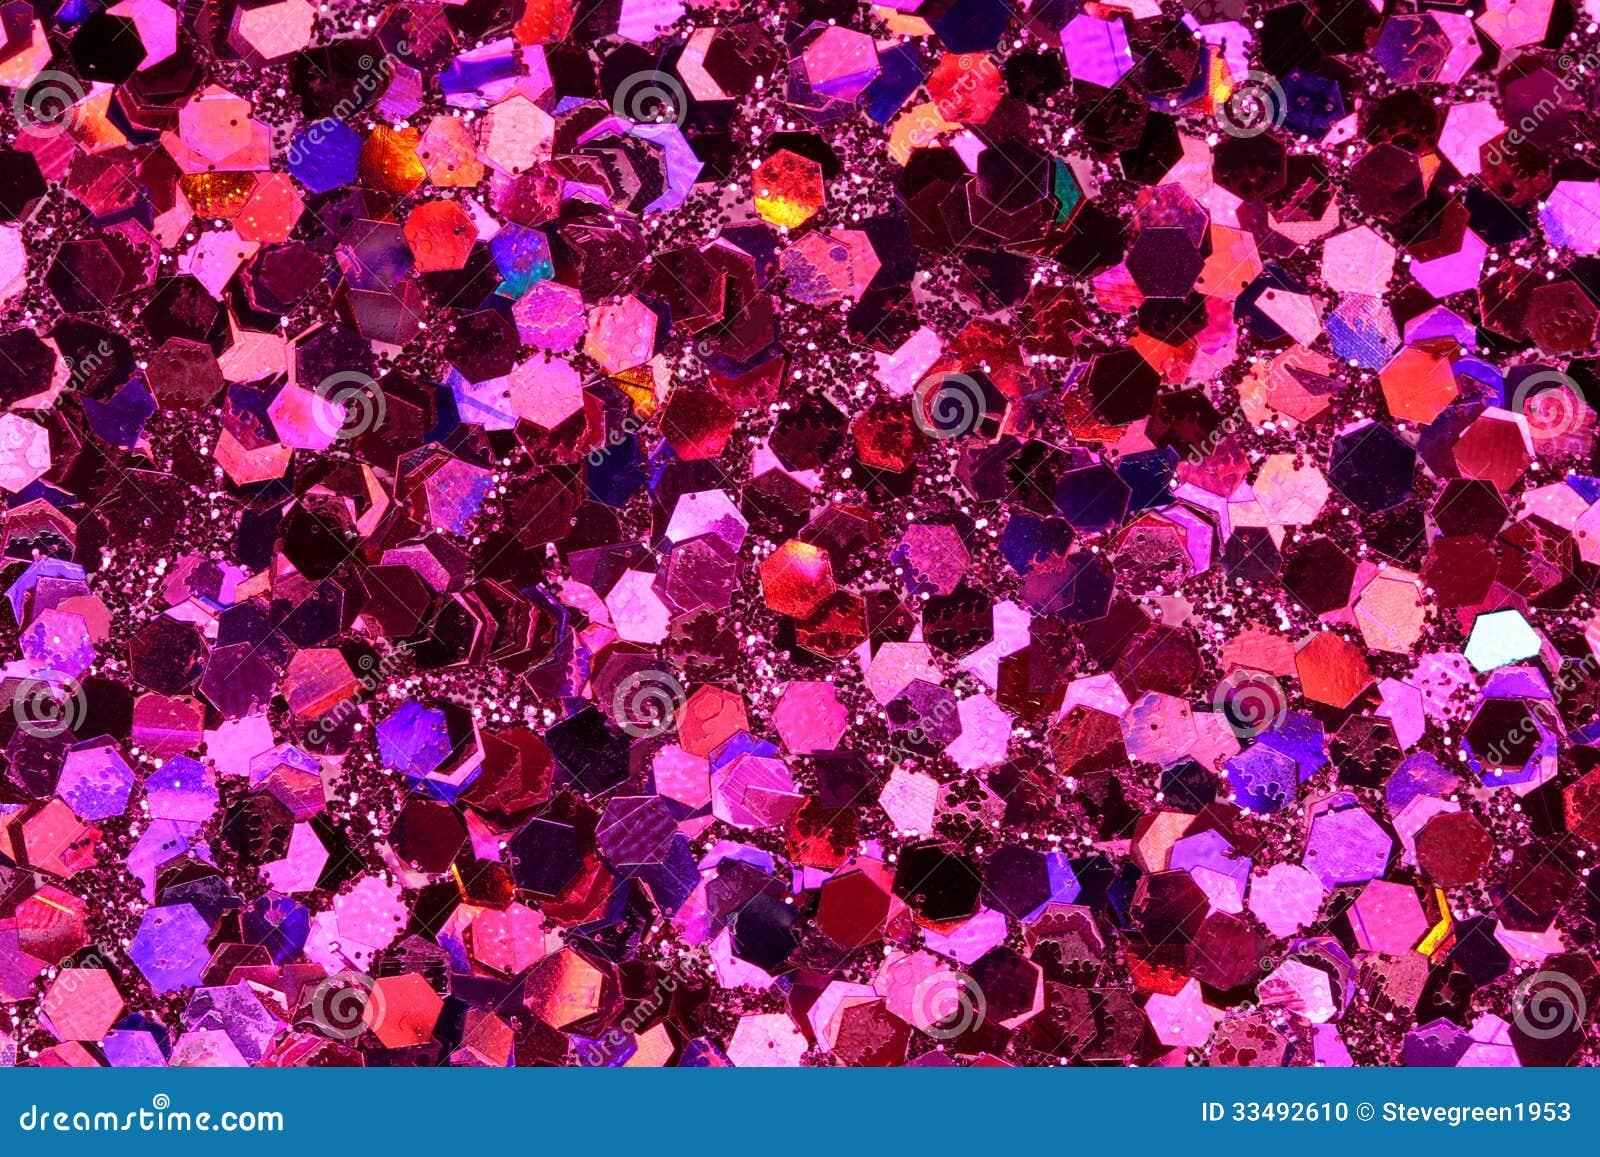 Swan Lake Clipart Red, Pink, Purple Glit...